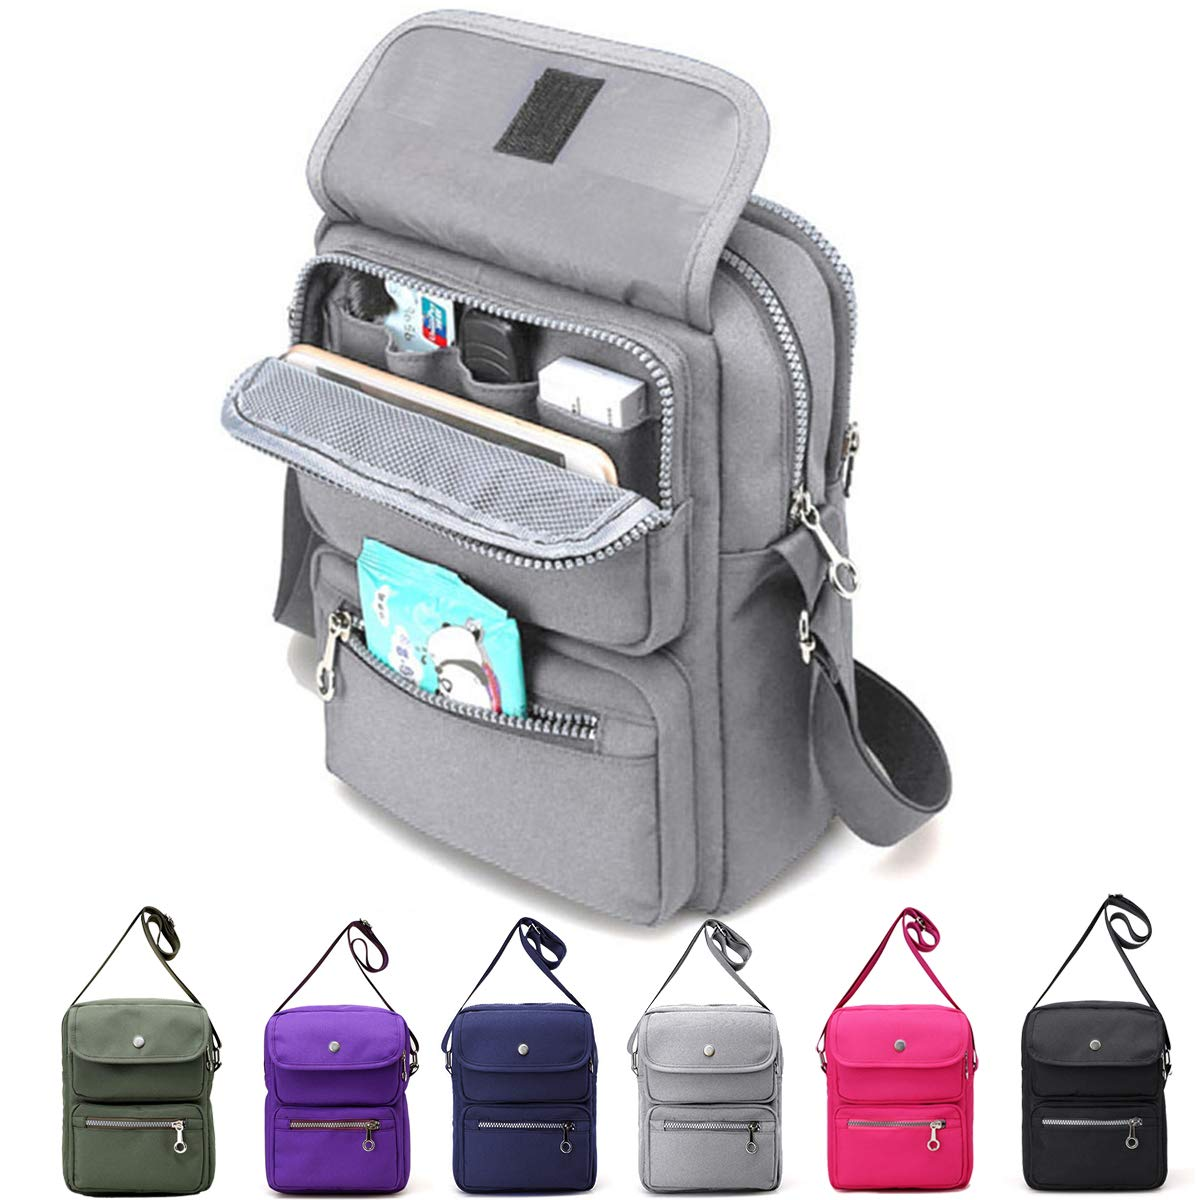 Review of JOSEKO Multi-Pocketed Nylon Cross Body Bag